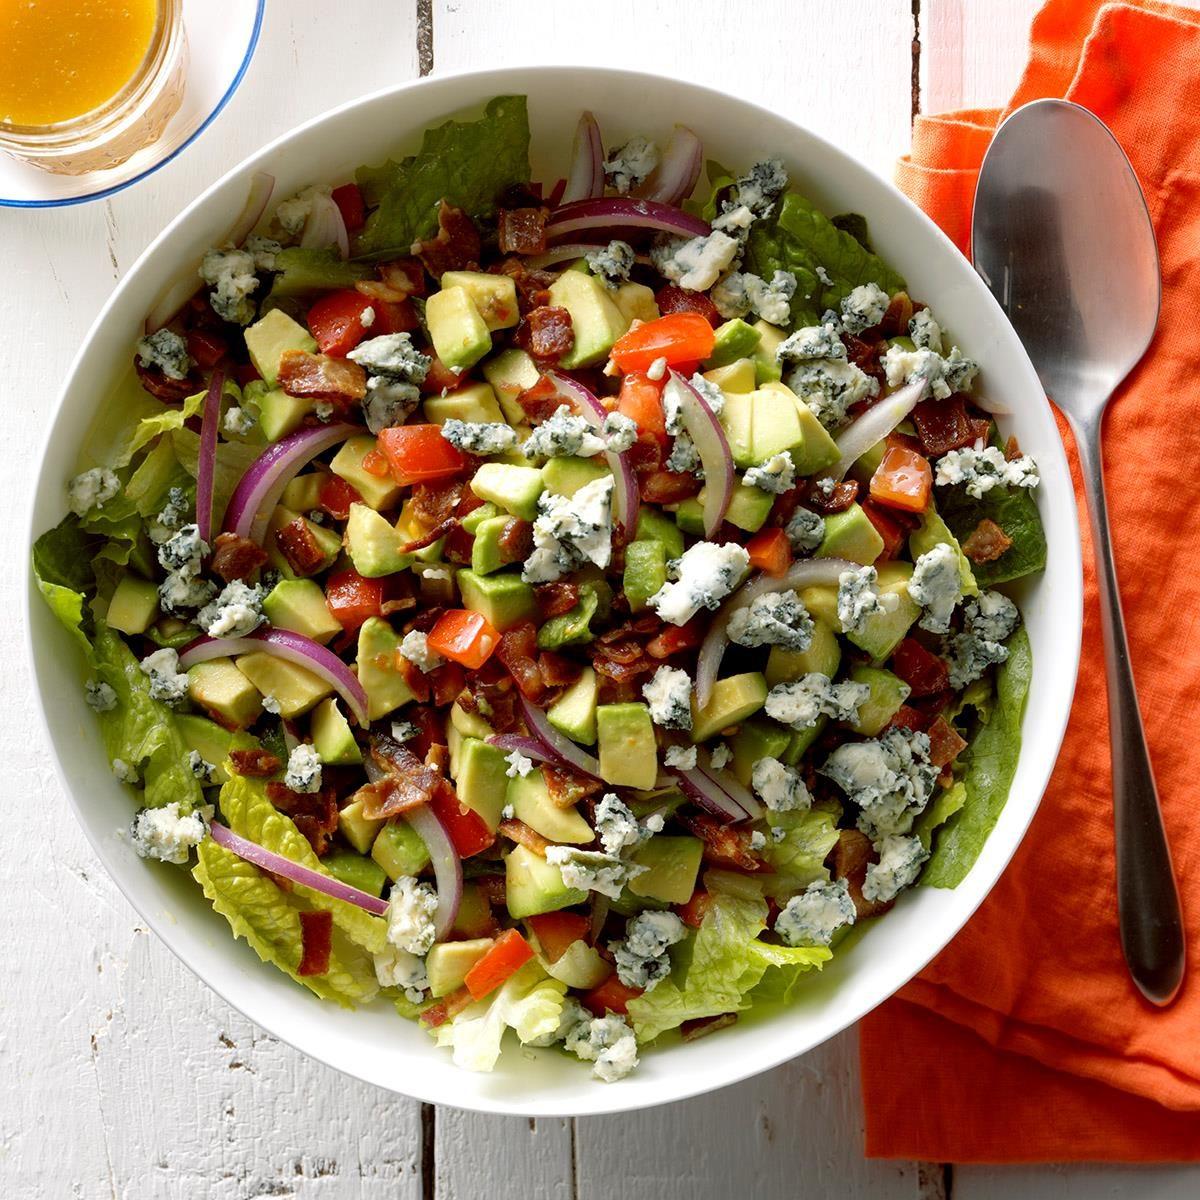 Connecticut: Bacon Avocado Salad